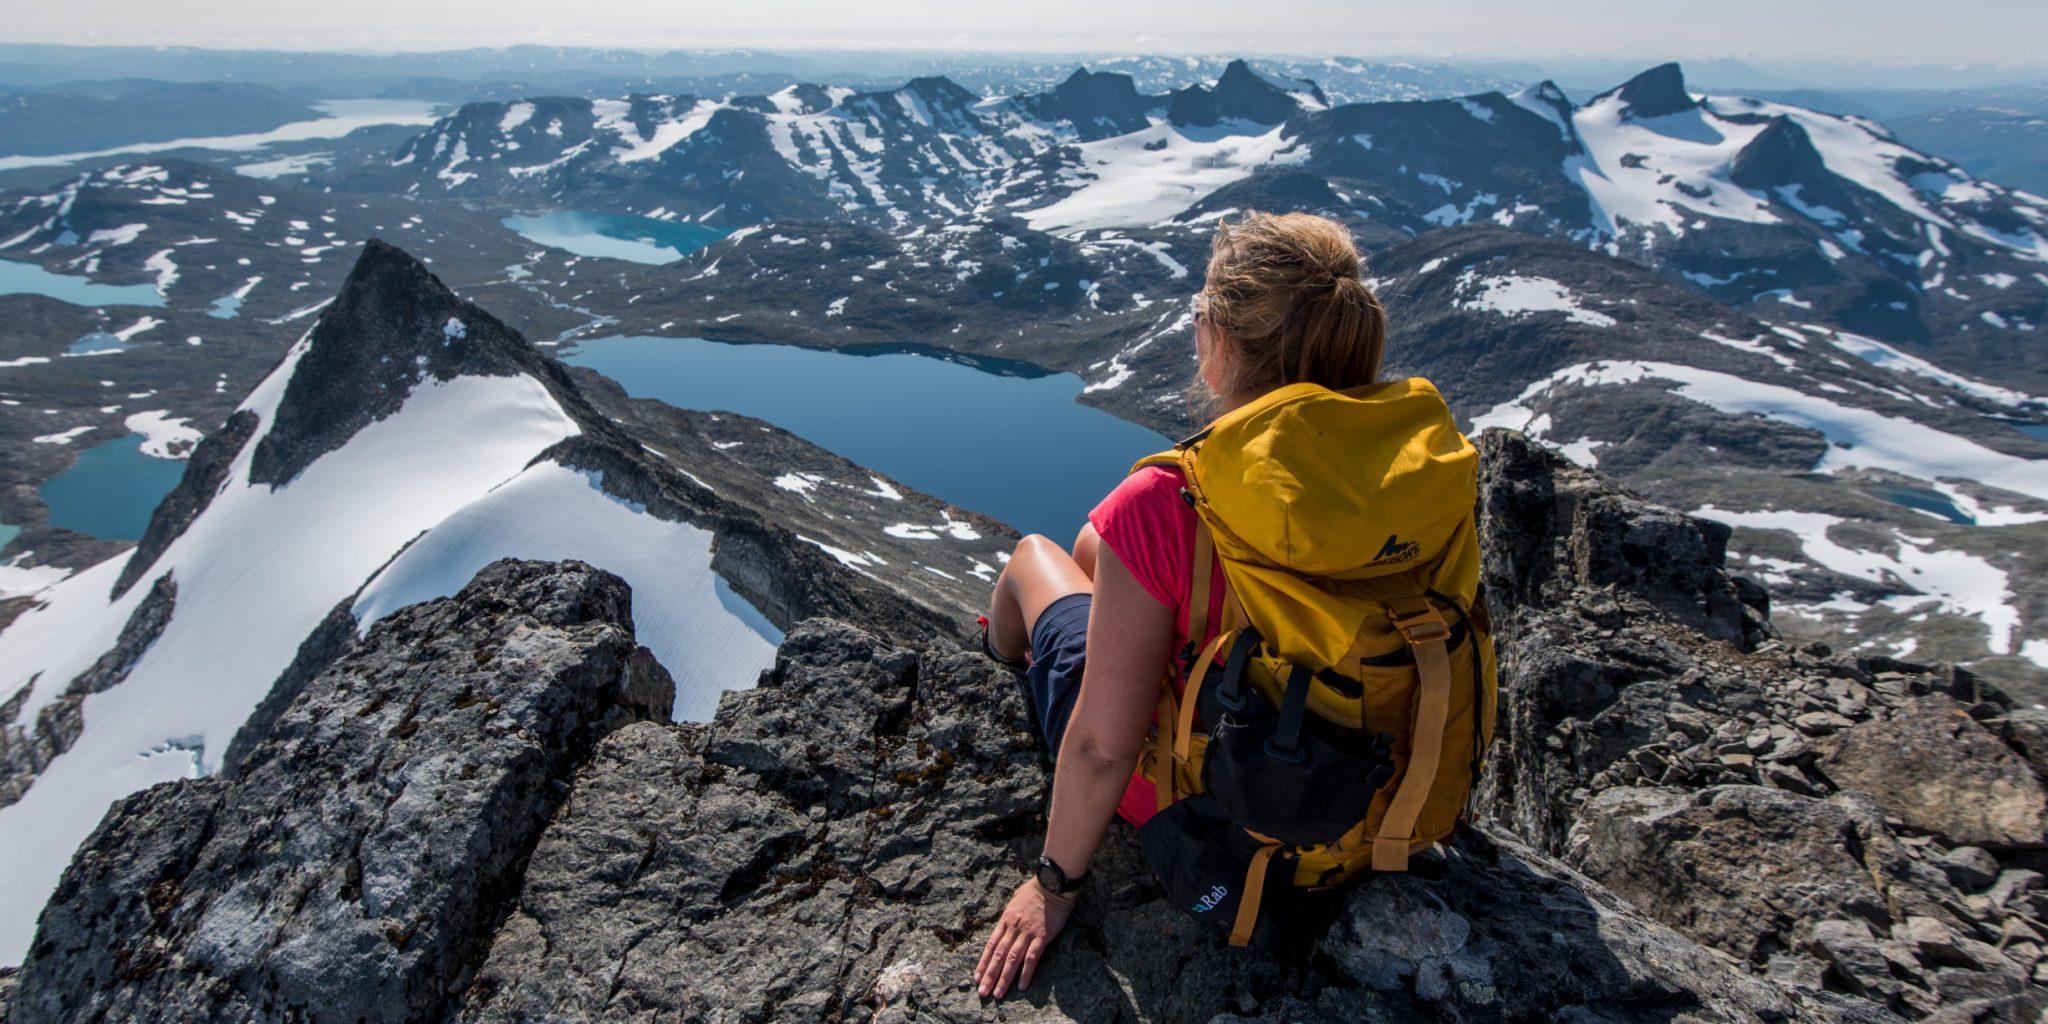 On top of peak Uranostind in Jotunheimen – Yngve Ask